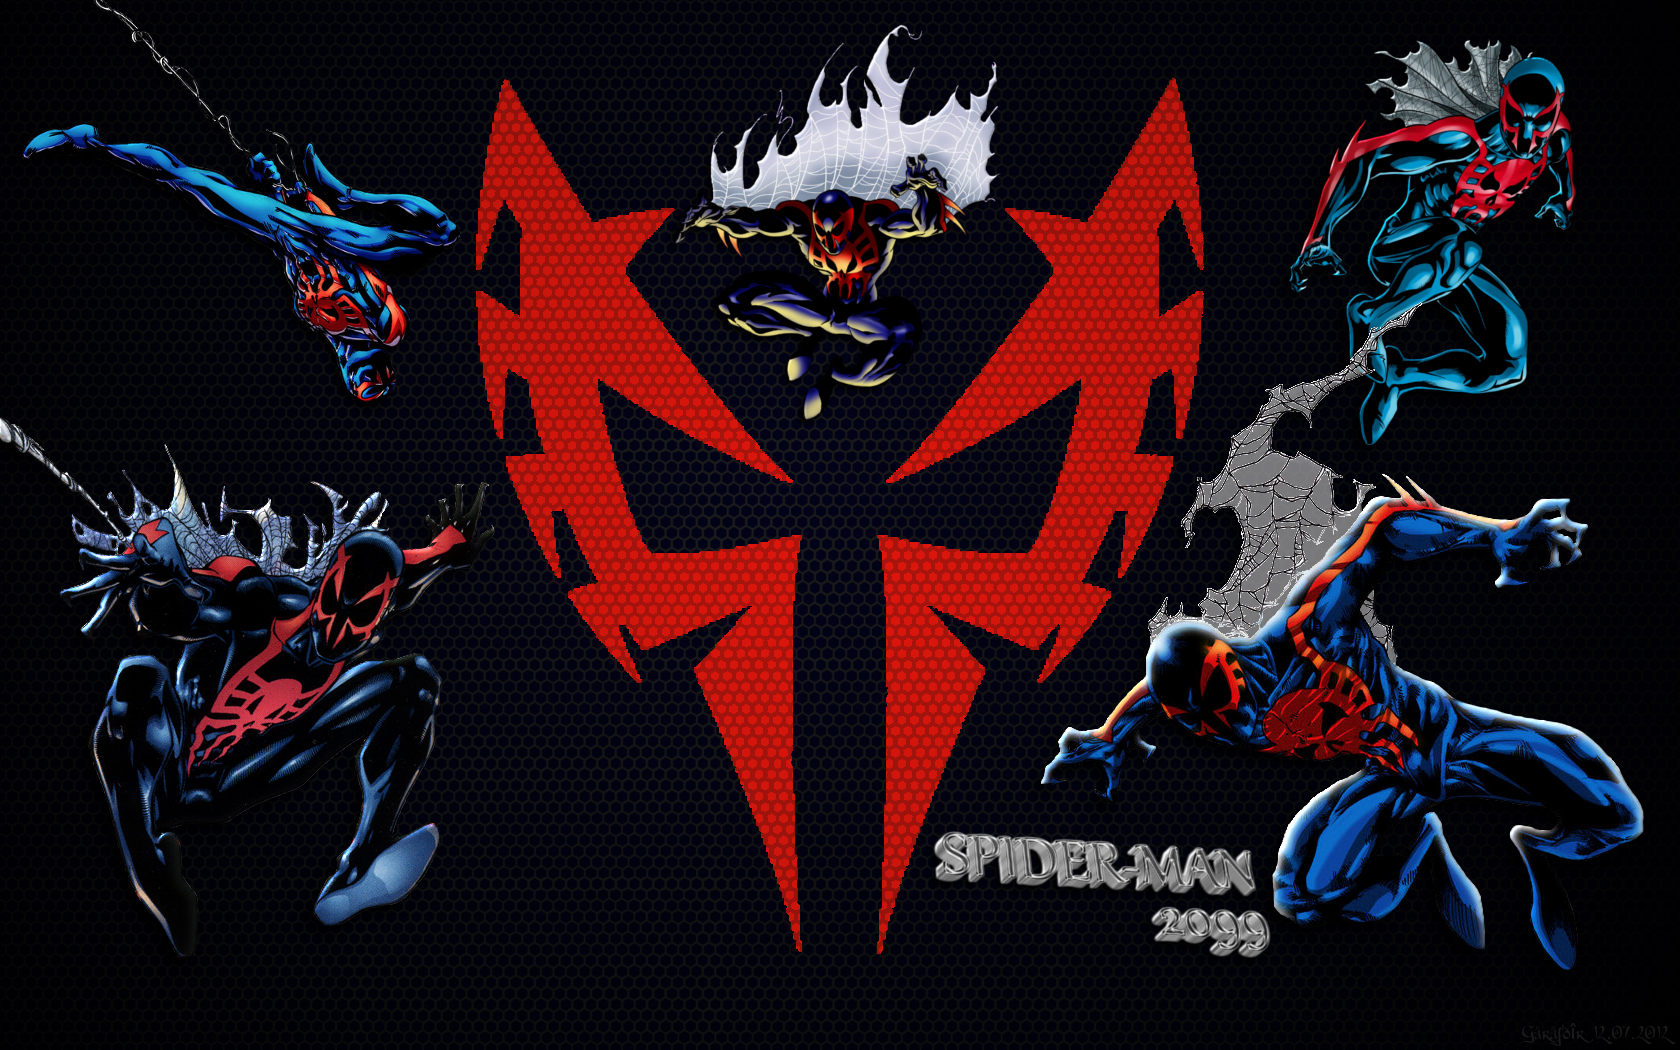 Spider Man 2099 Wallpaper On Wallpaperget Com: Spider Man 2099 Wallpaper